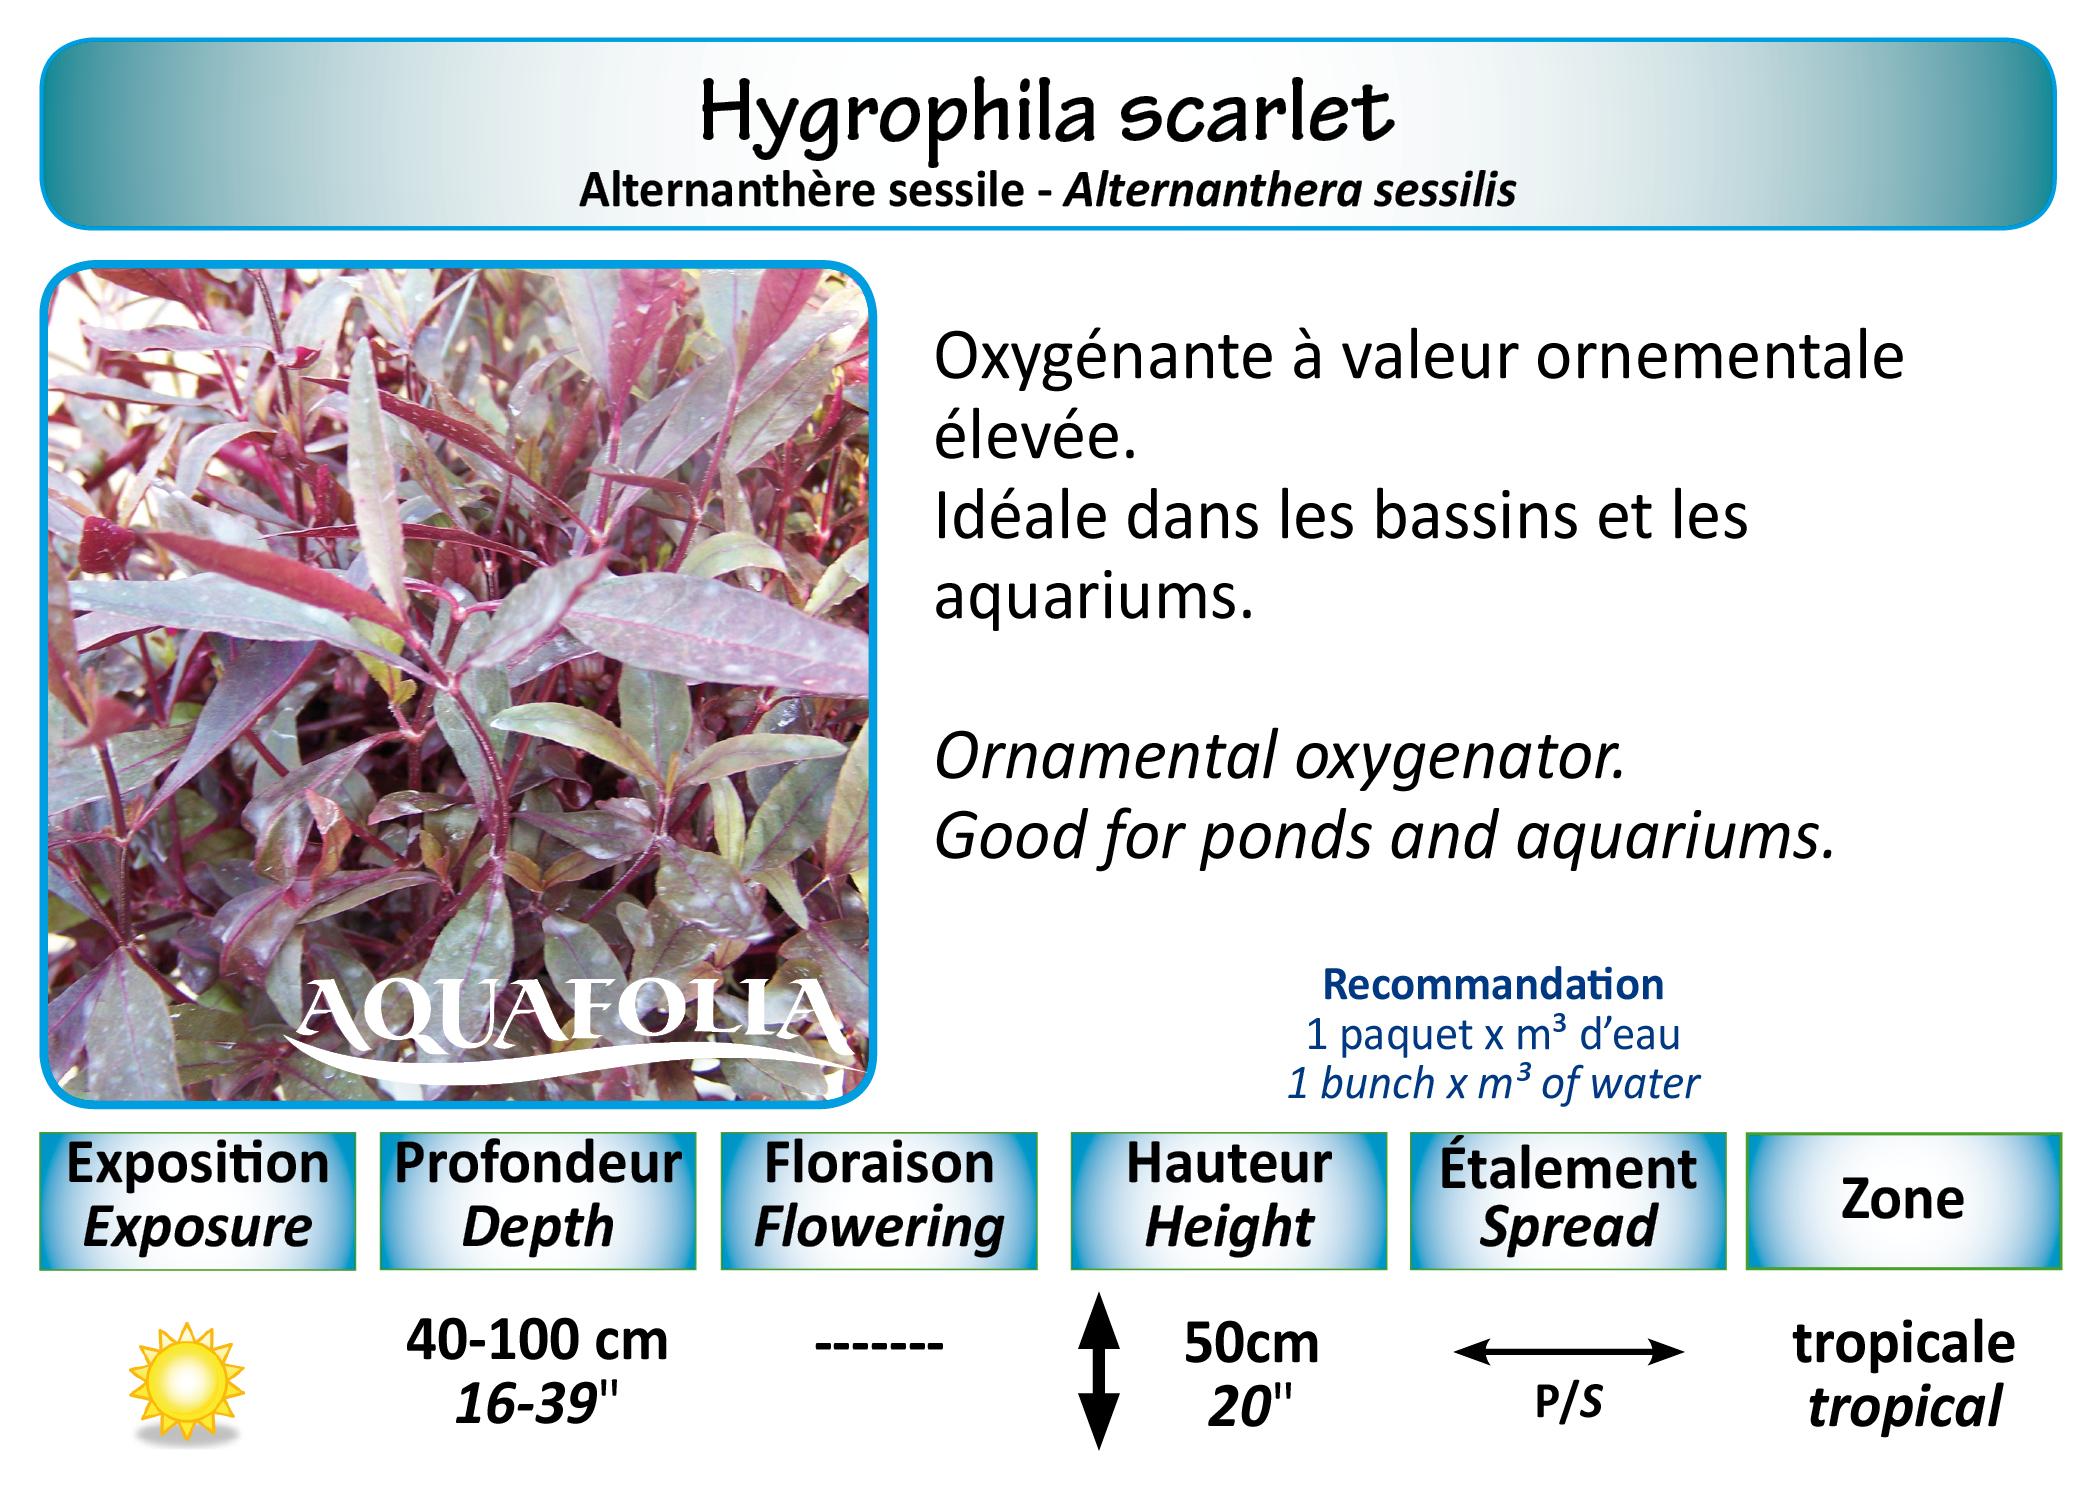 Names Index Ak 47 Exploded Diagram Http Forumnationstatesnet Viewtopicphpf Hygrophila Scarlet 5x7